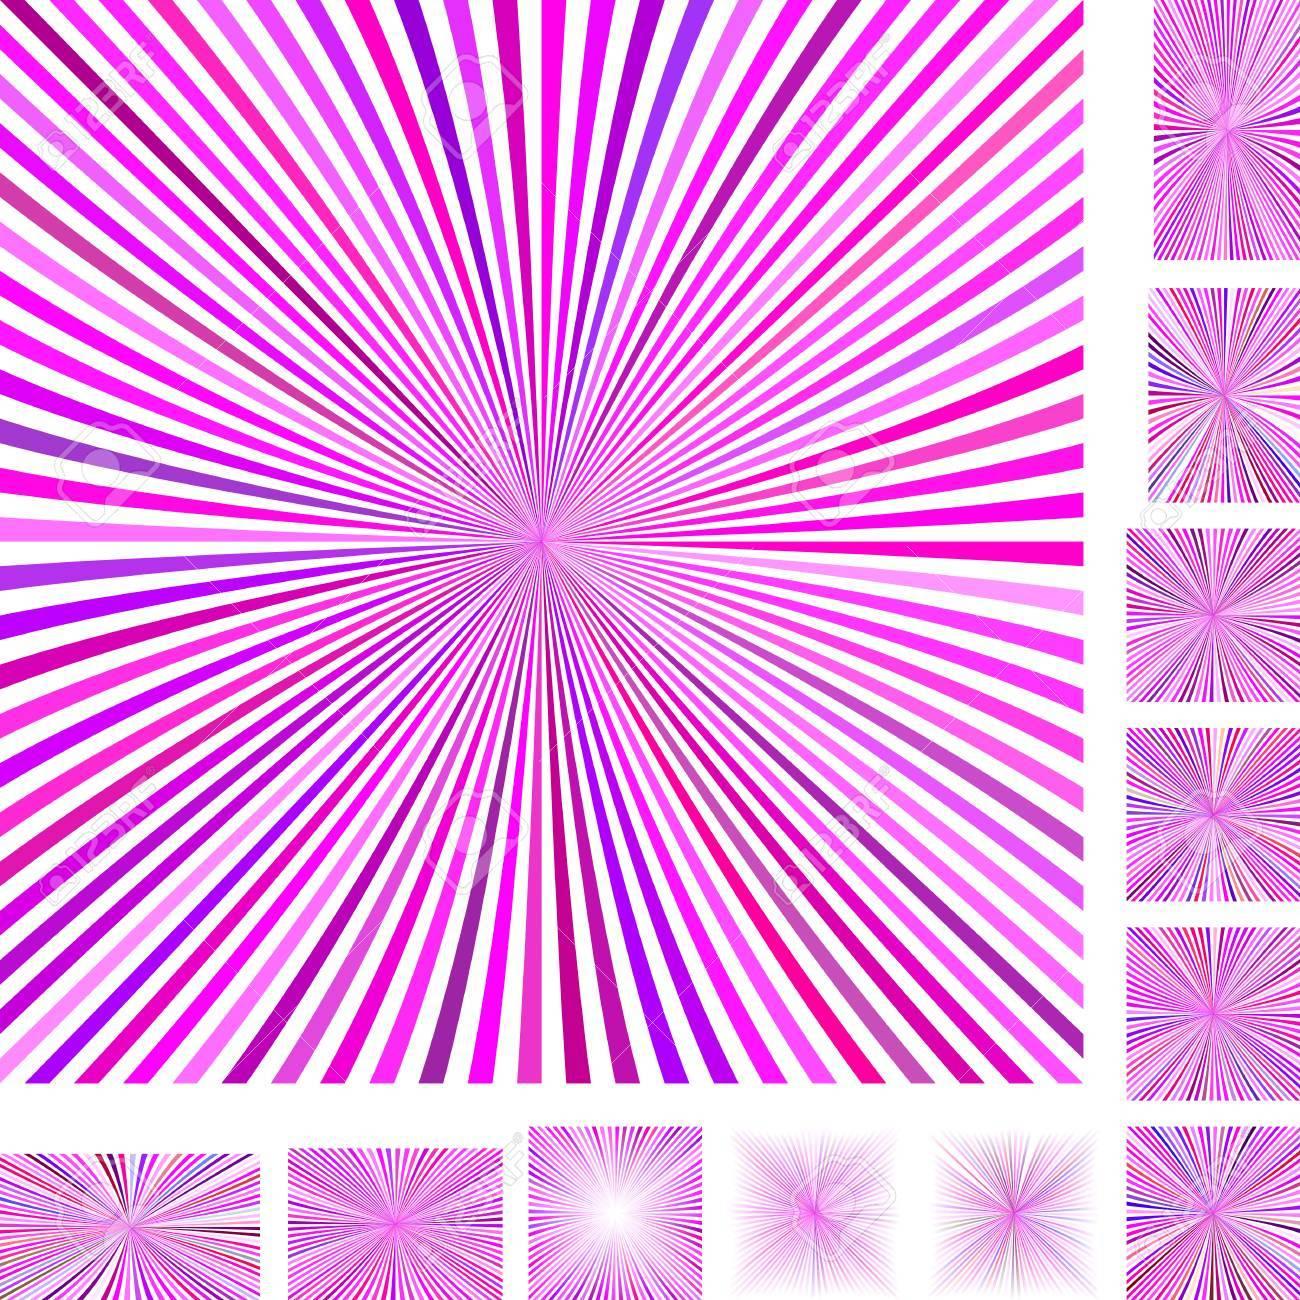 verschillende kleuren roze